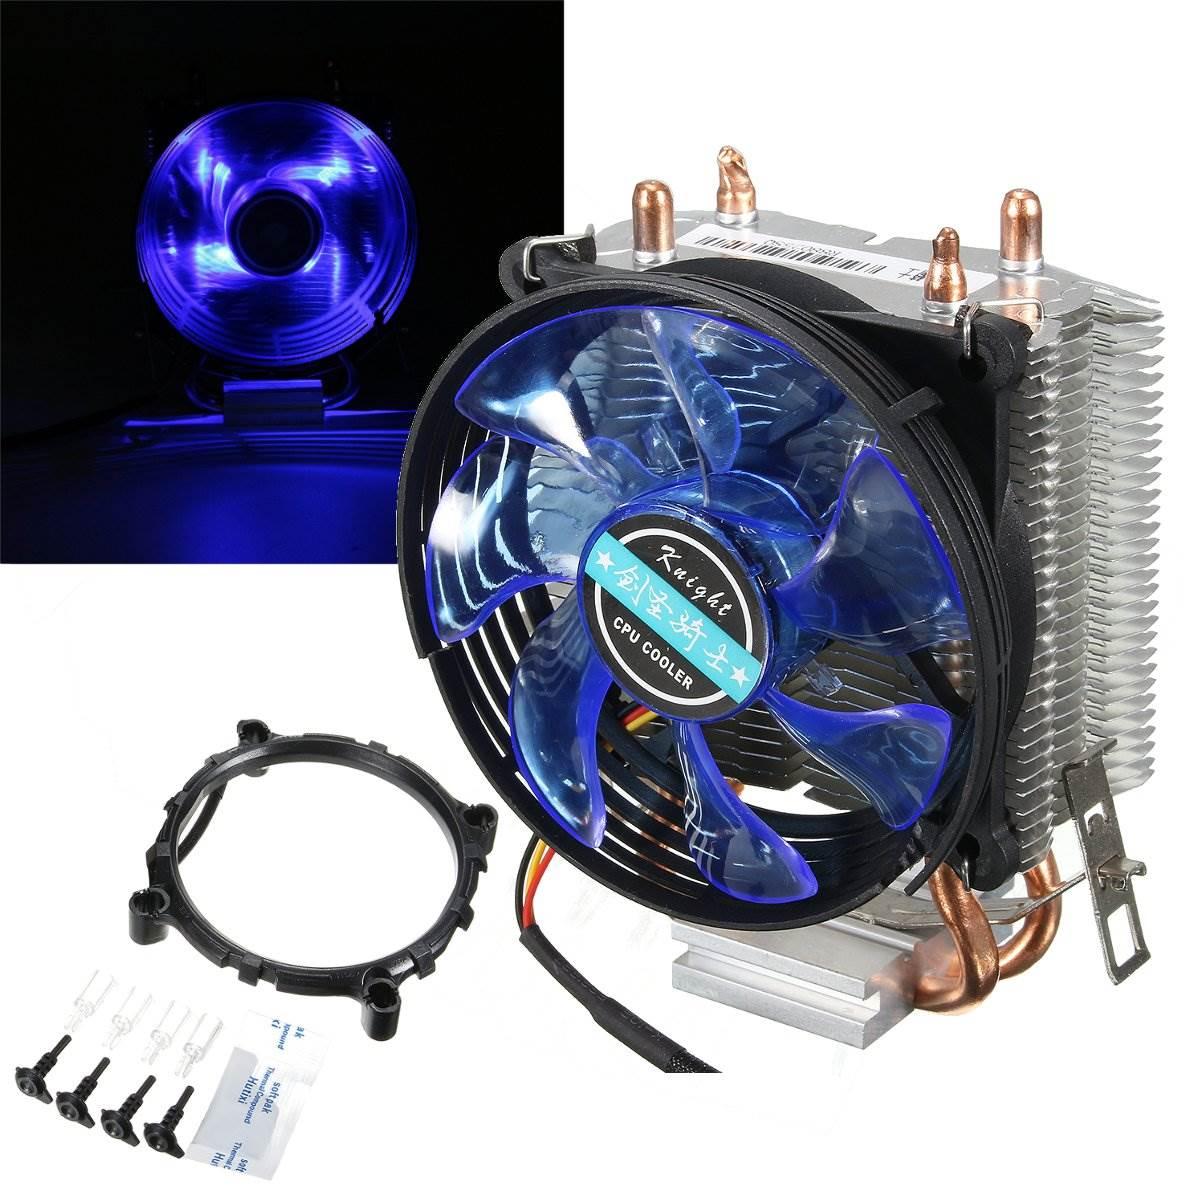 Newest 95x95x25mm LED Cooler Cpu Fan Heatsink Copper for Intel LGA775/1156/1155 for AMD AM2/AM2+/AM3(China (Mainland))